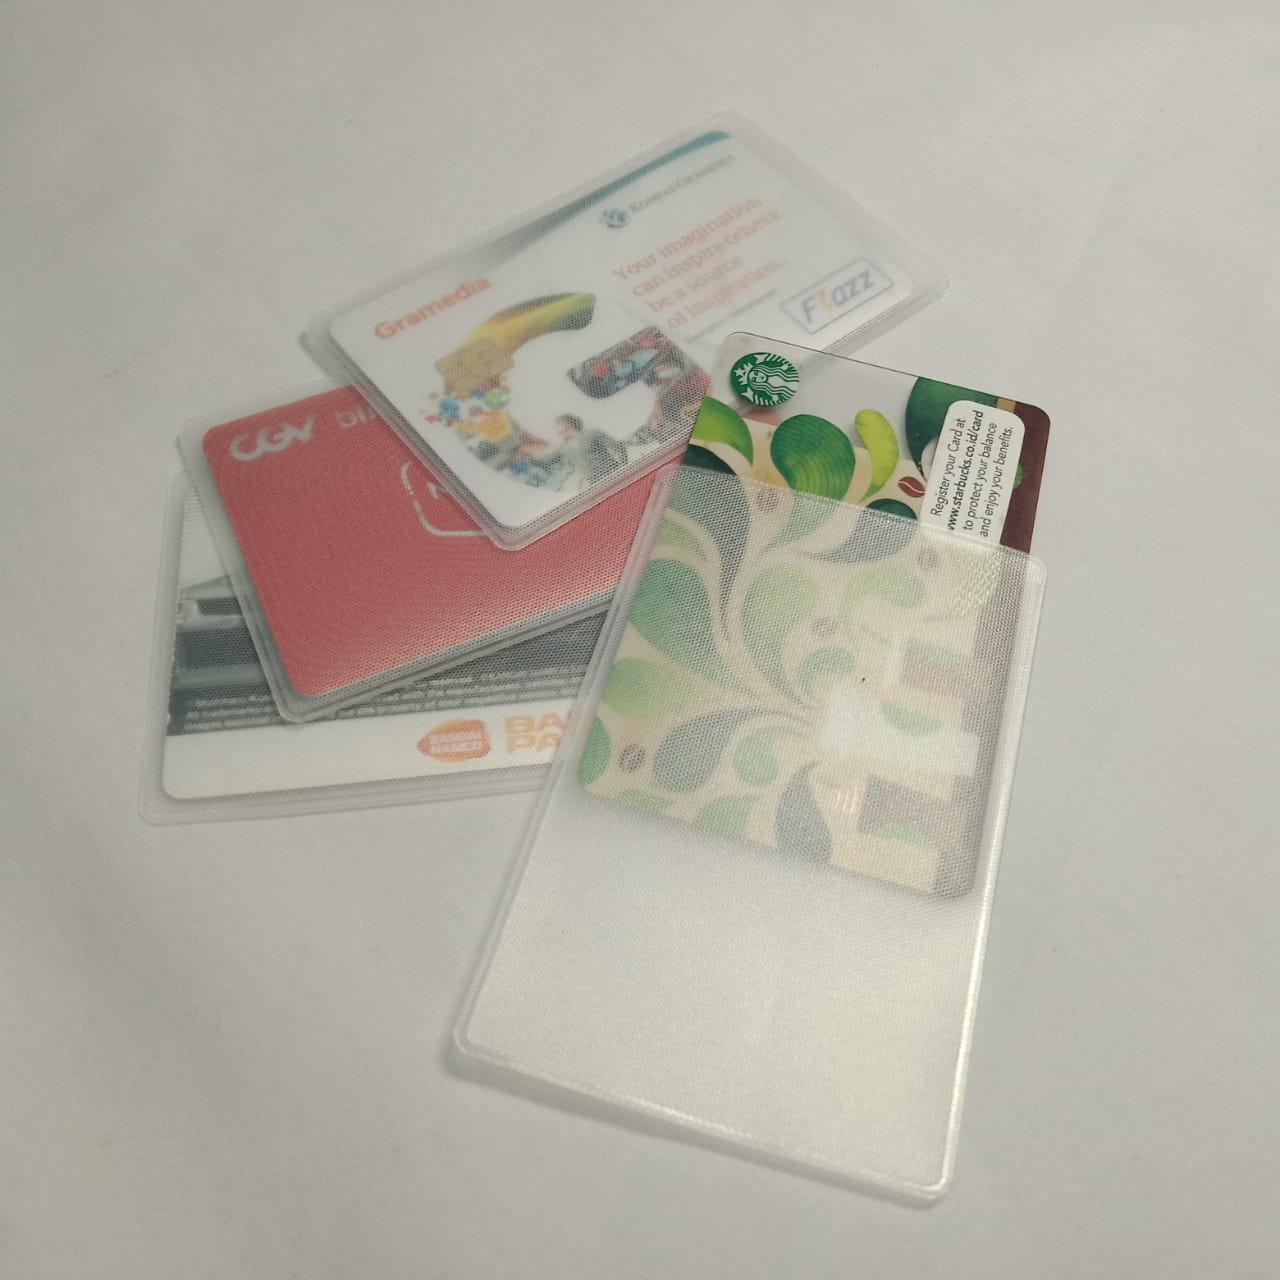 Minimall - 237  (15pcs for 3000) Sampul Cover Kartu plastik kartu kantong etoll sampul kartu atm kantong plastik atm buram